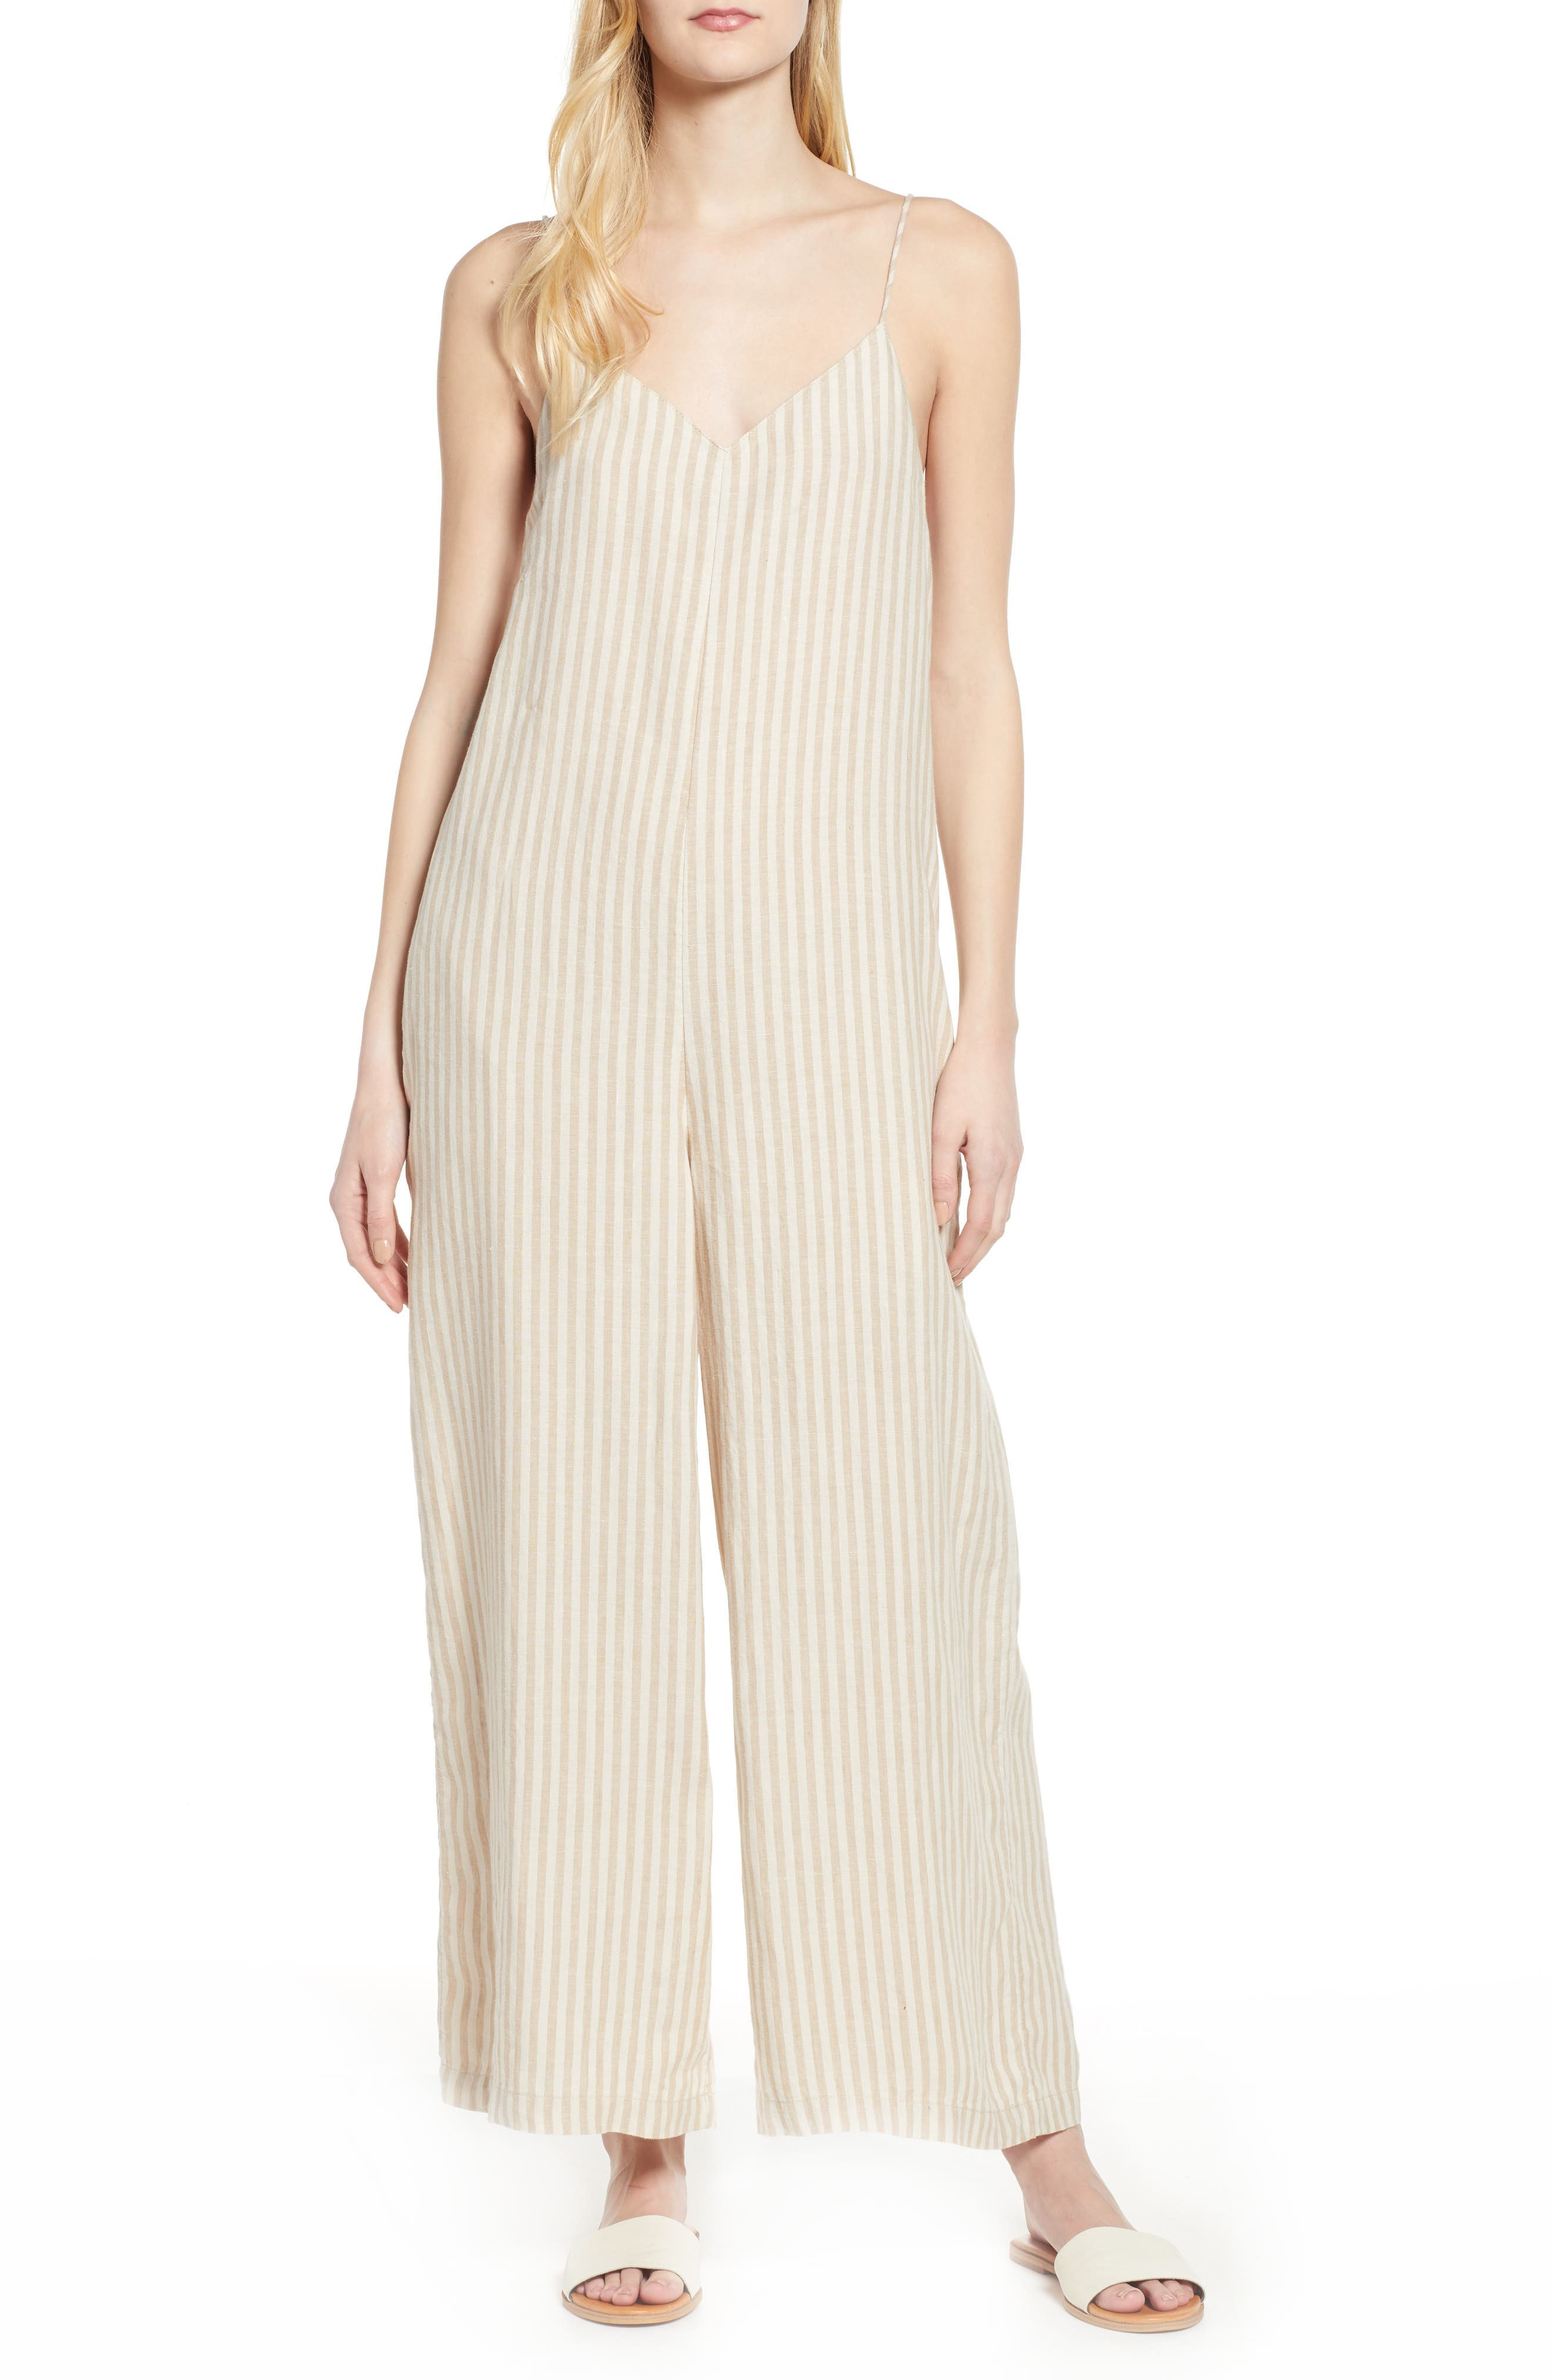 Lou & Grey Stripe Linen Jumpsuit, Ivory